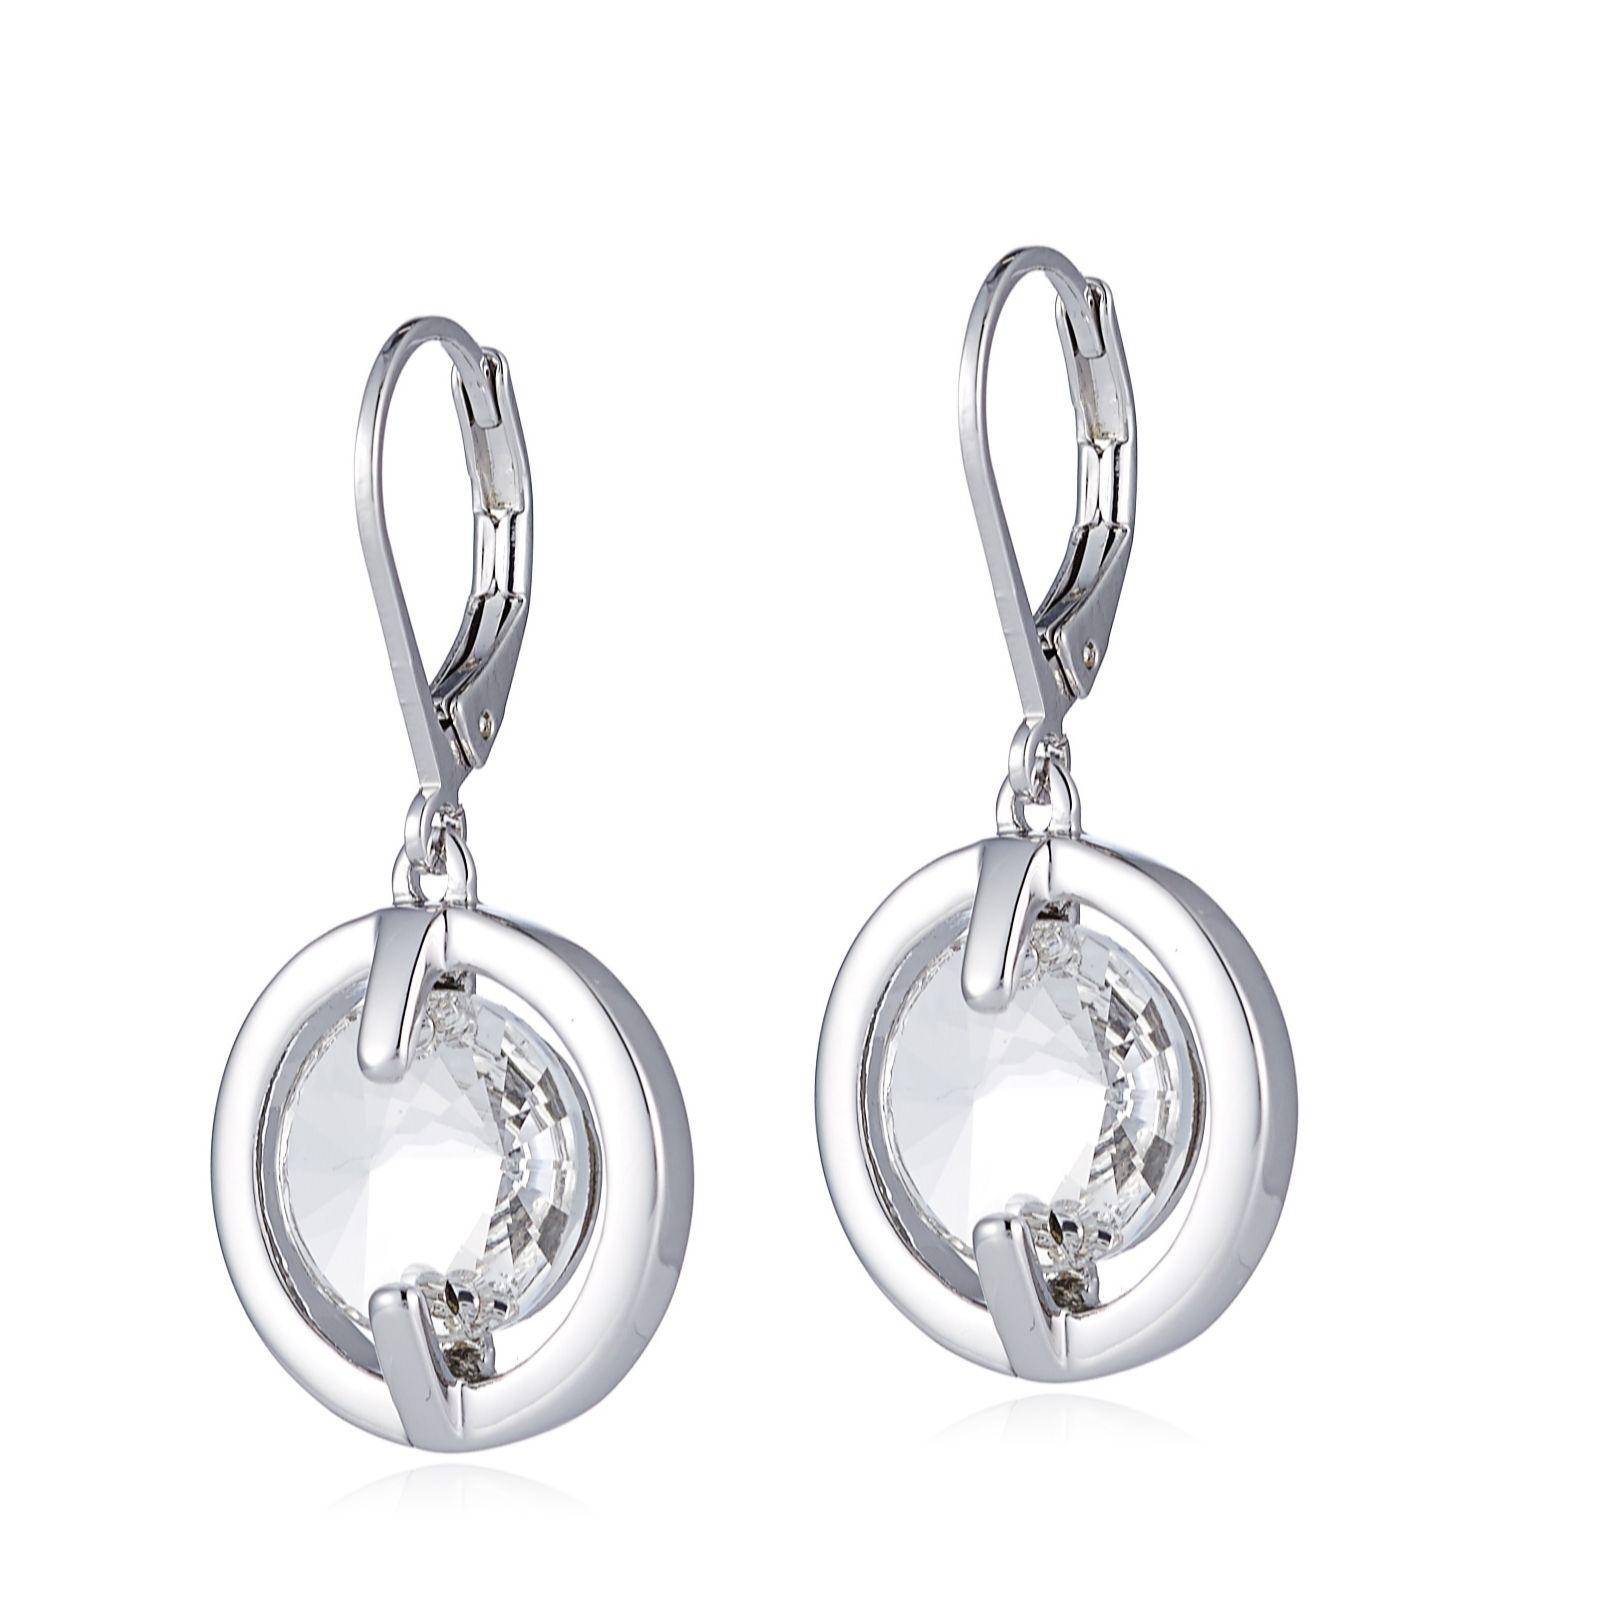 57204c068 Outlet Aurora Swarovski Crystal Lever Back Drop Earrings - QVC UK